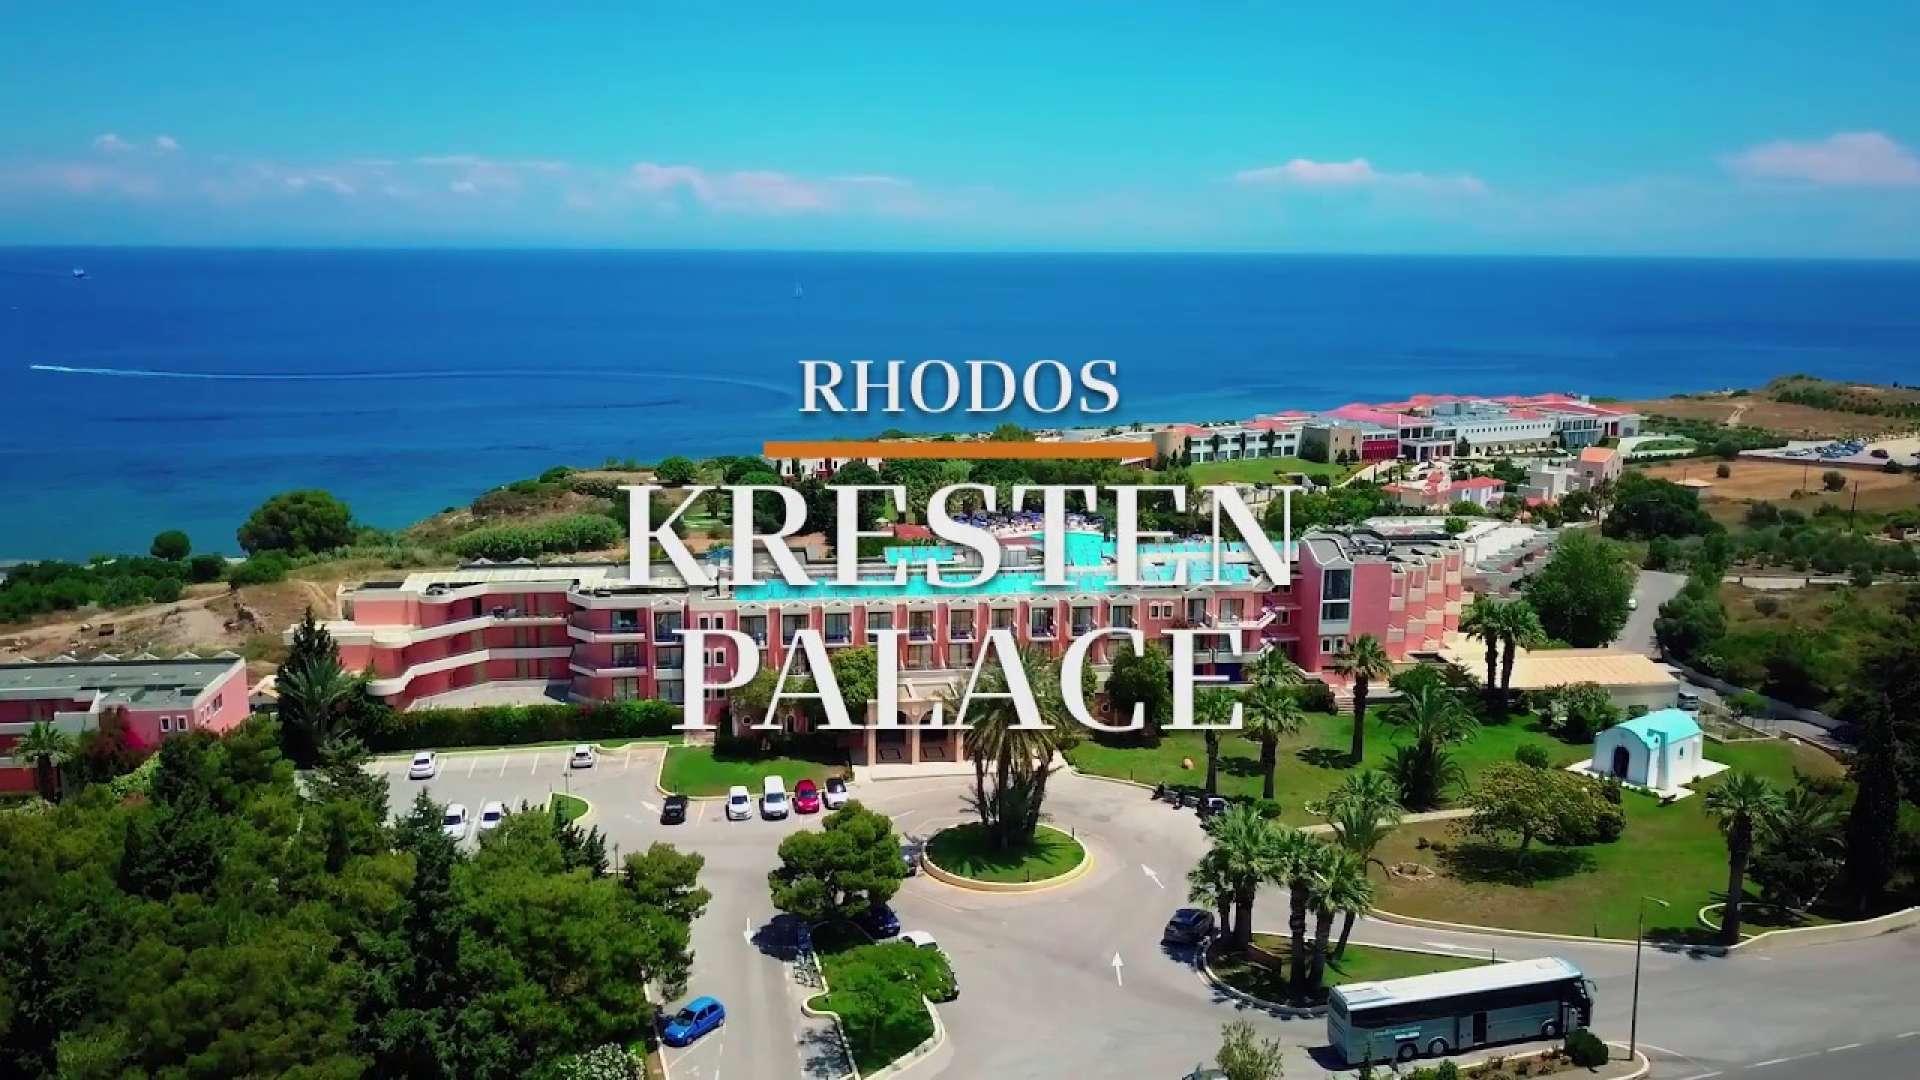 Kresten palace m mini all inclusive rhodos by kalithea for Rhodos koskinou